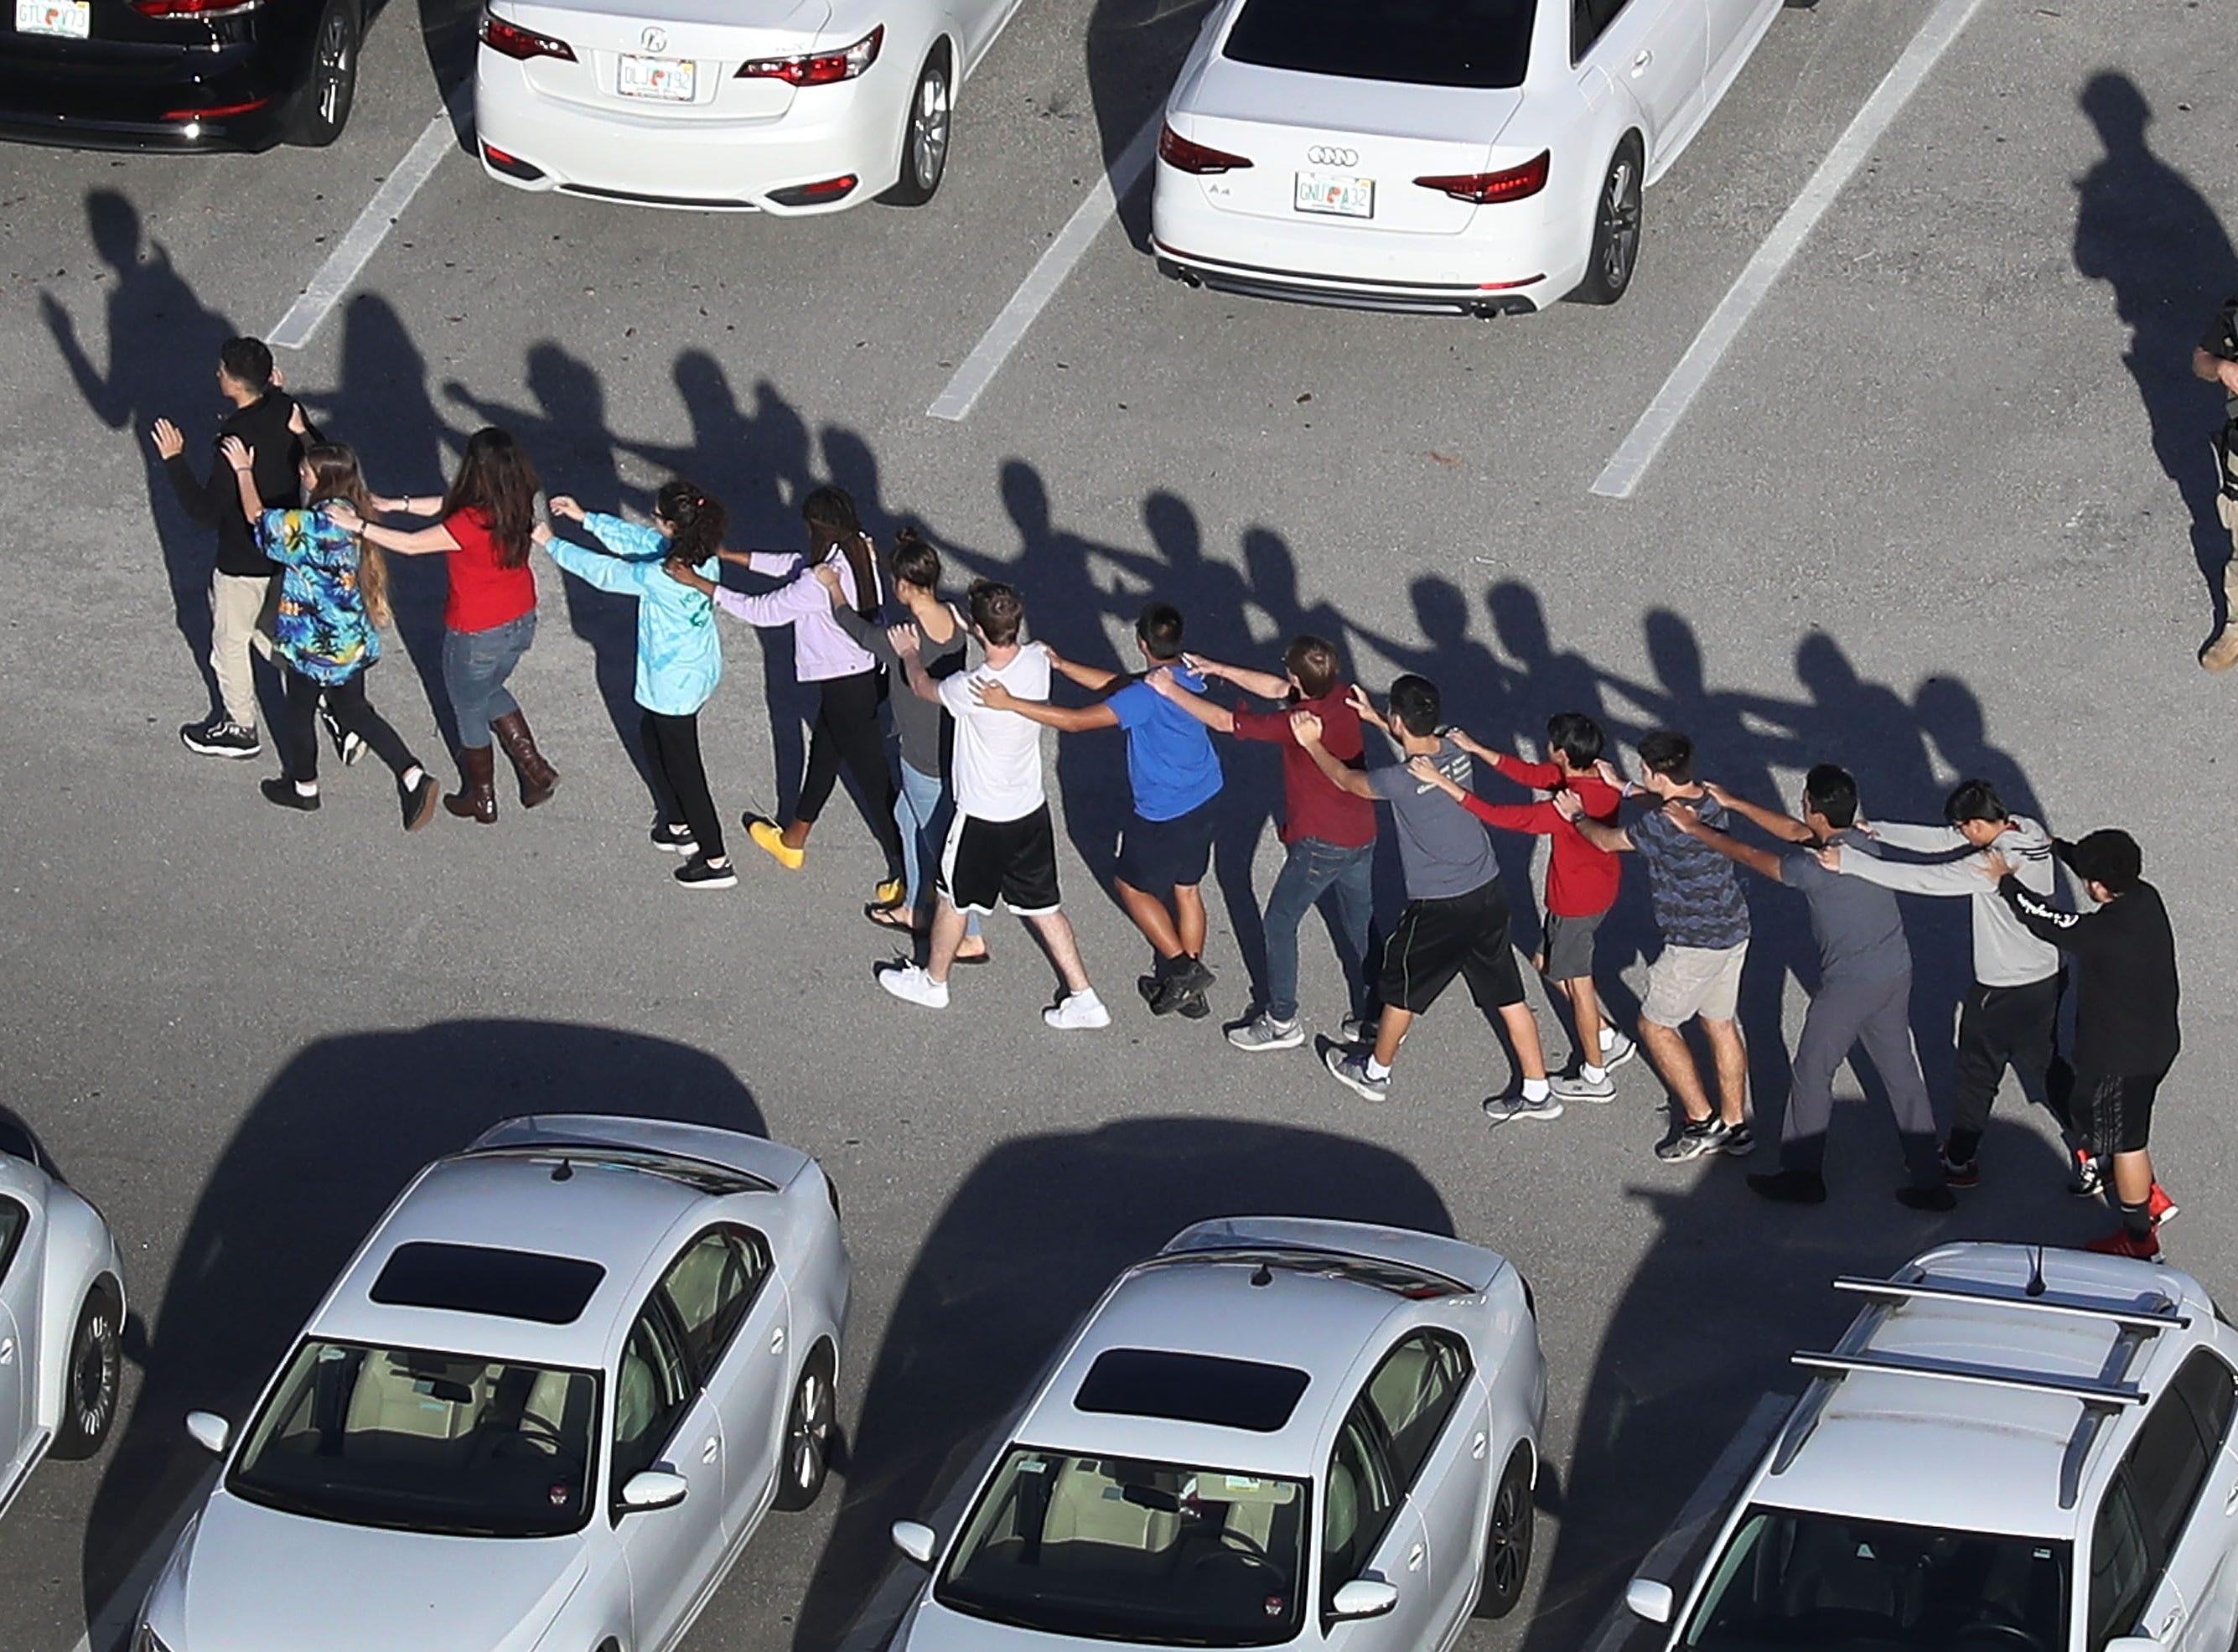 Police, schools had no duty to protect Parkland school shooting victims, judge rules